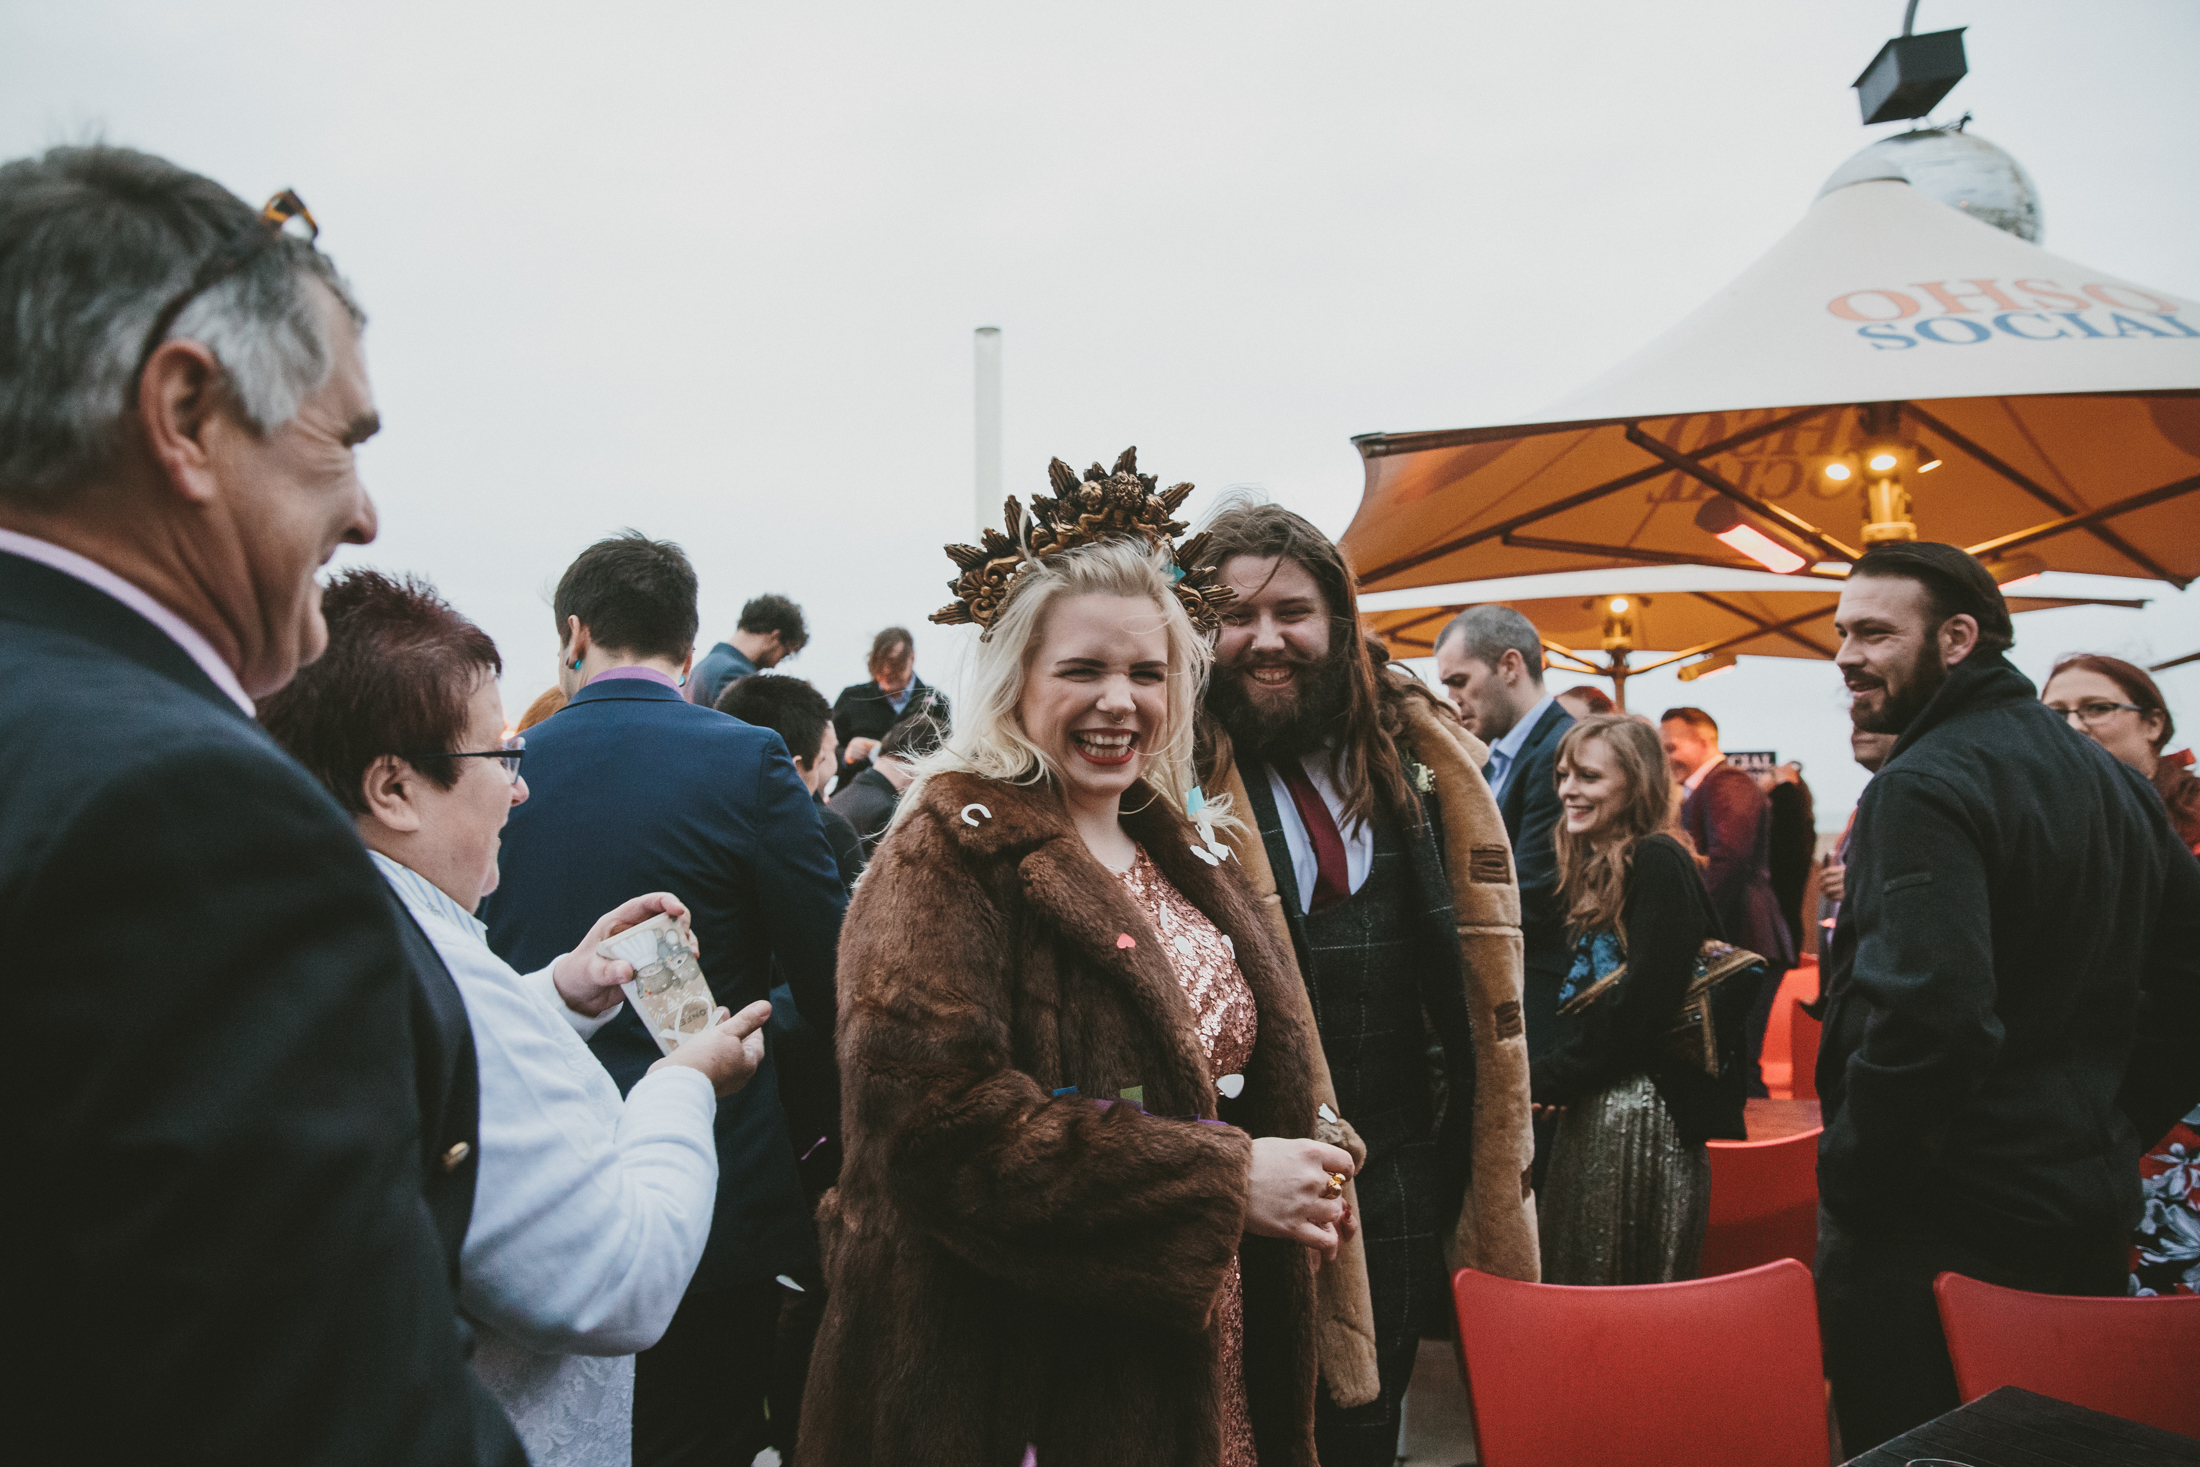 Brighton Wedding-59.jpg